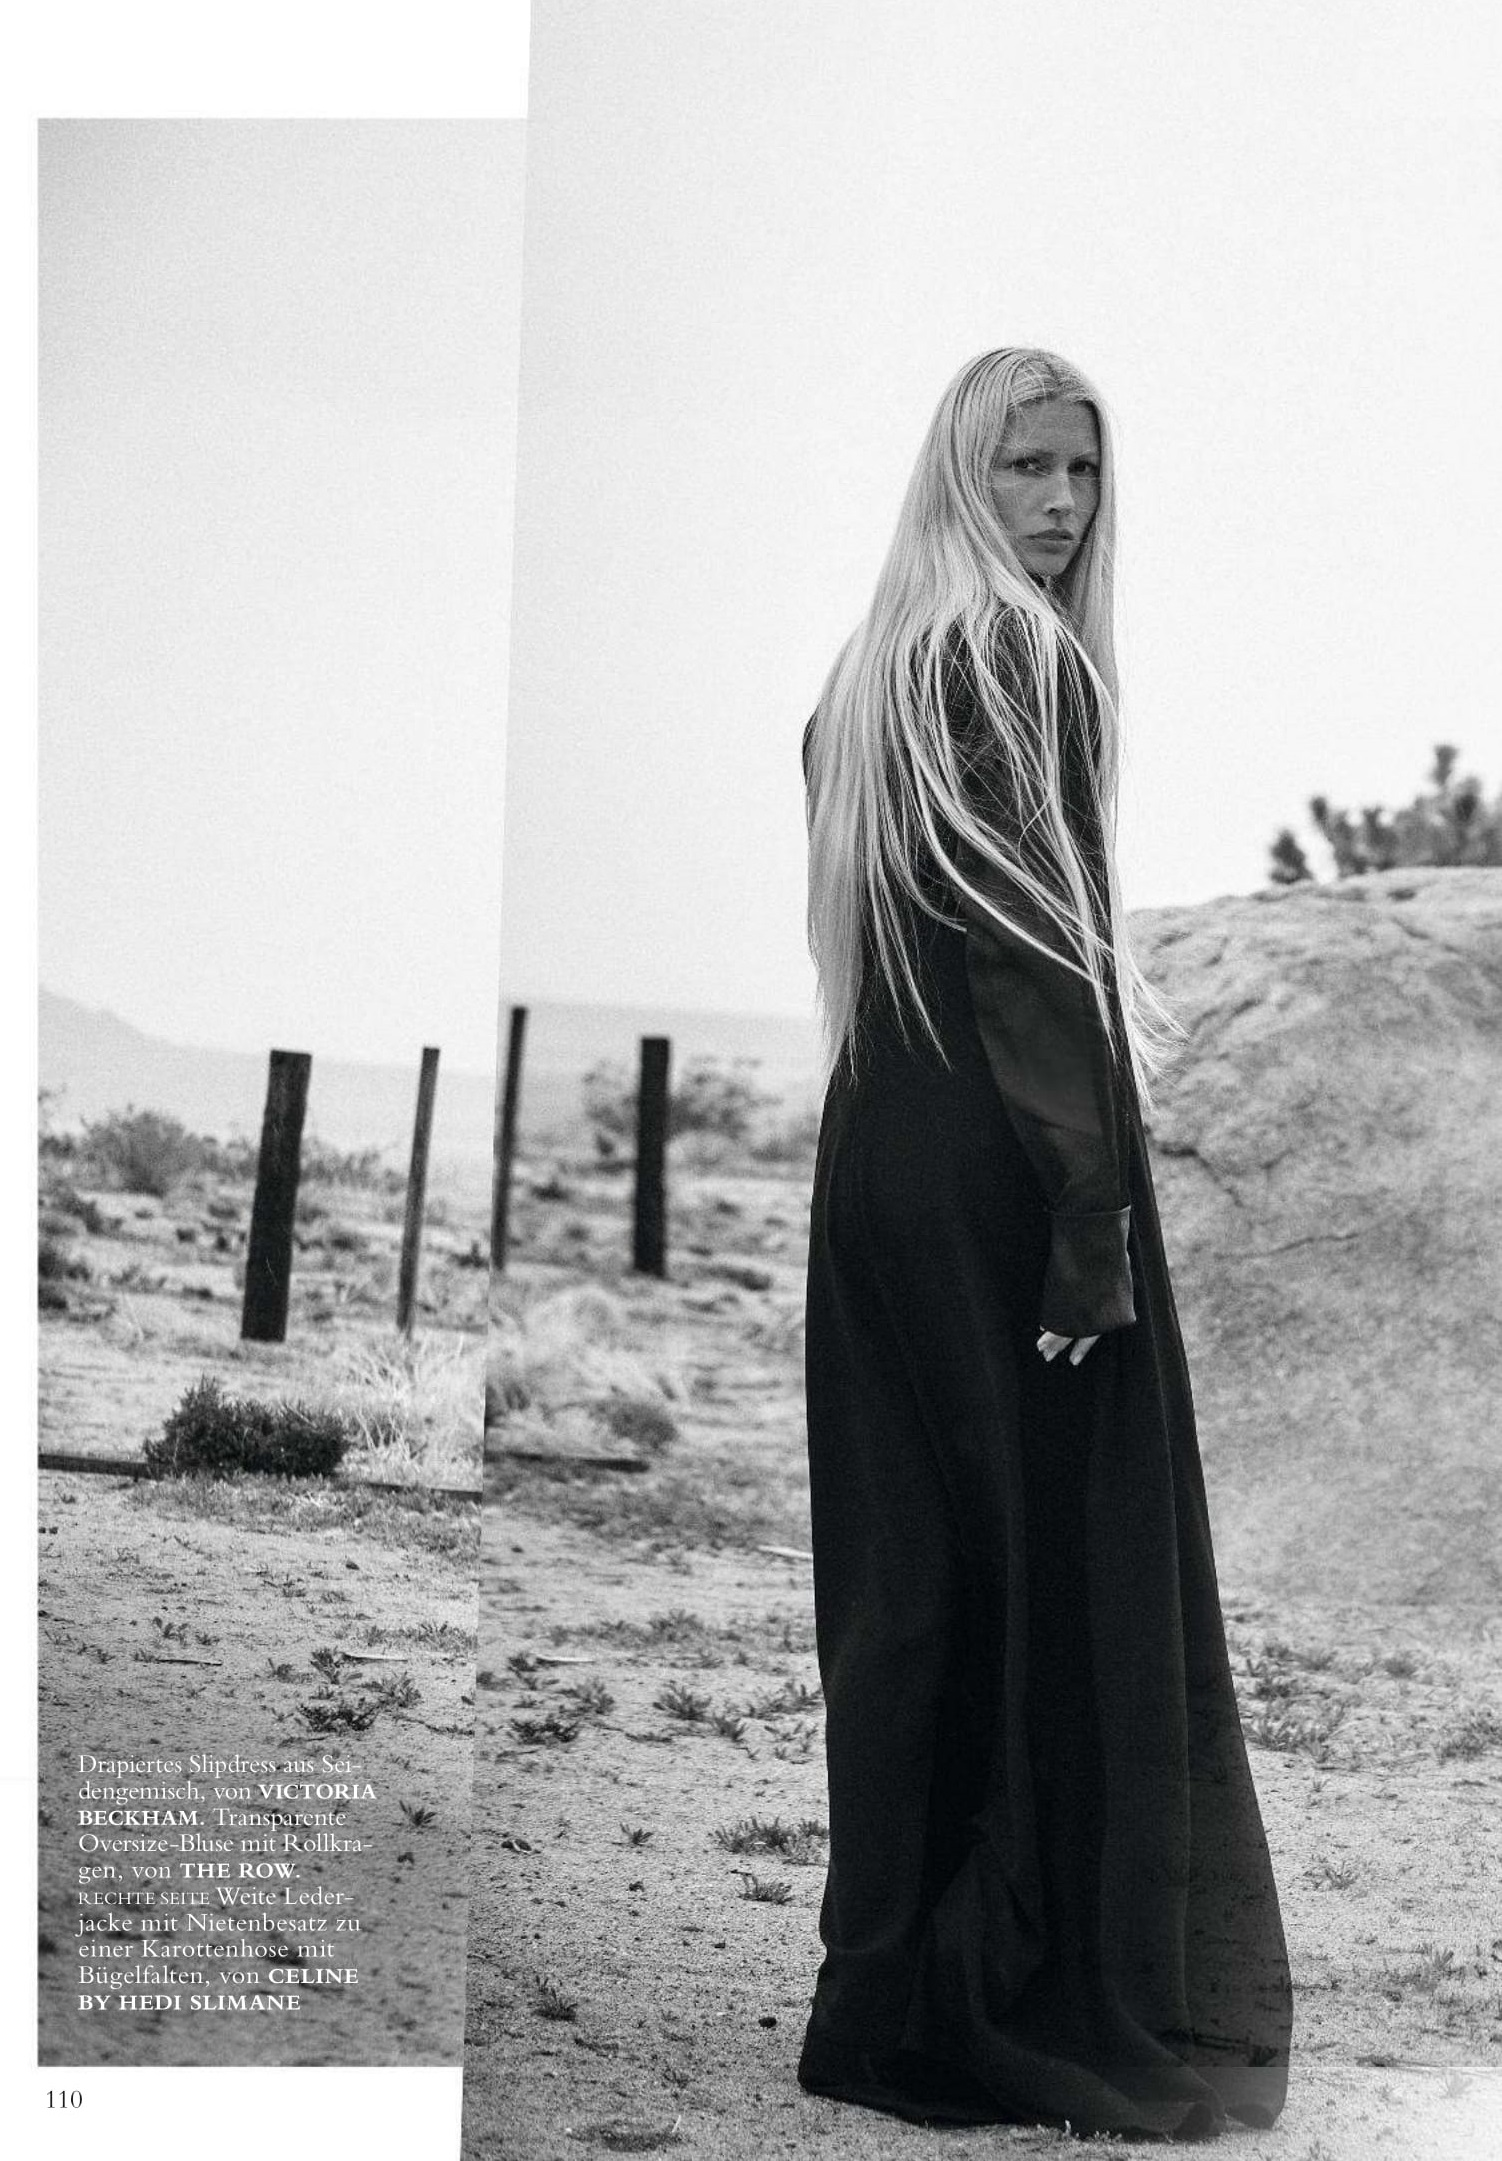 Kirsty-Hume-Regan-Cameron-Harpers-Bazaar-Germany-April-2019- (2).jpg